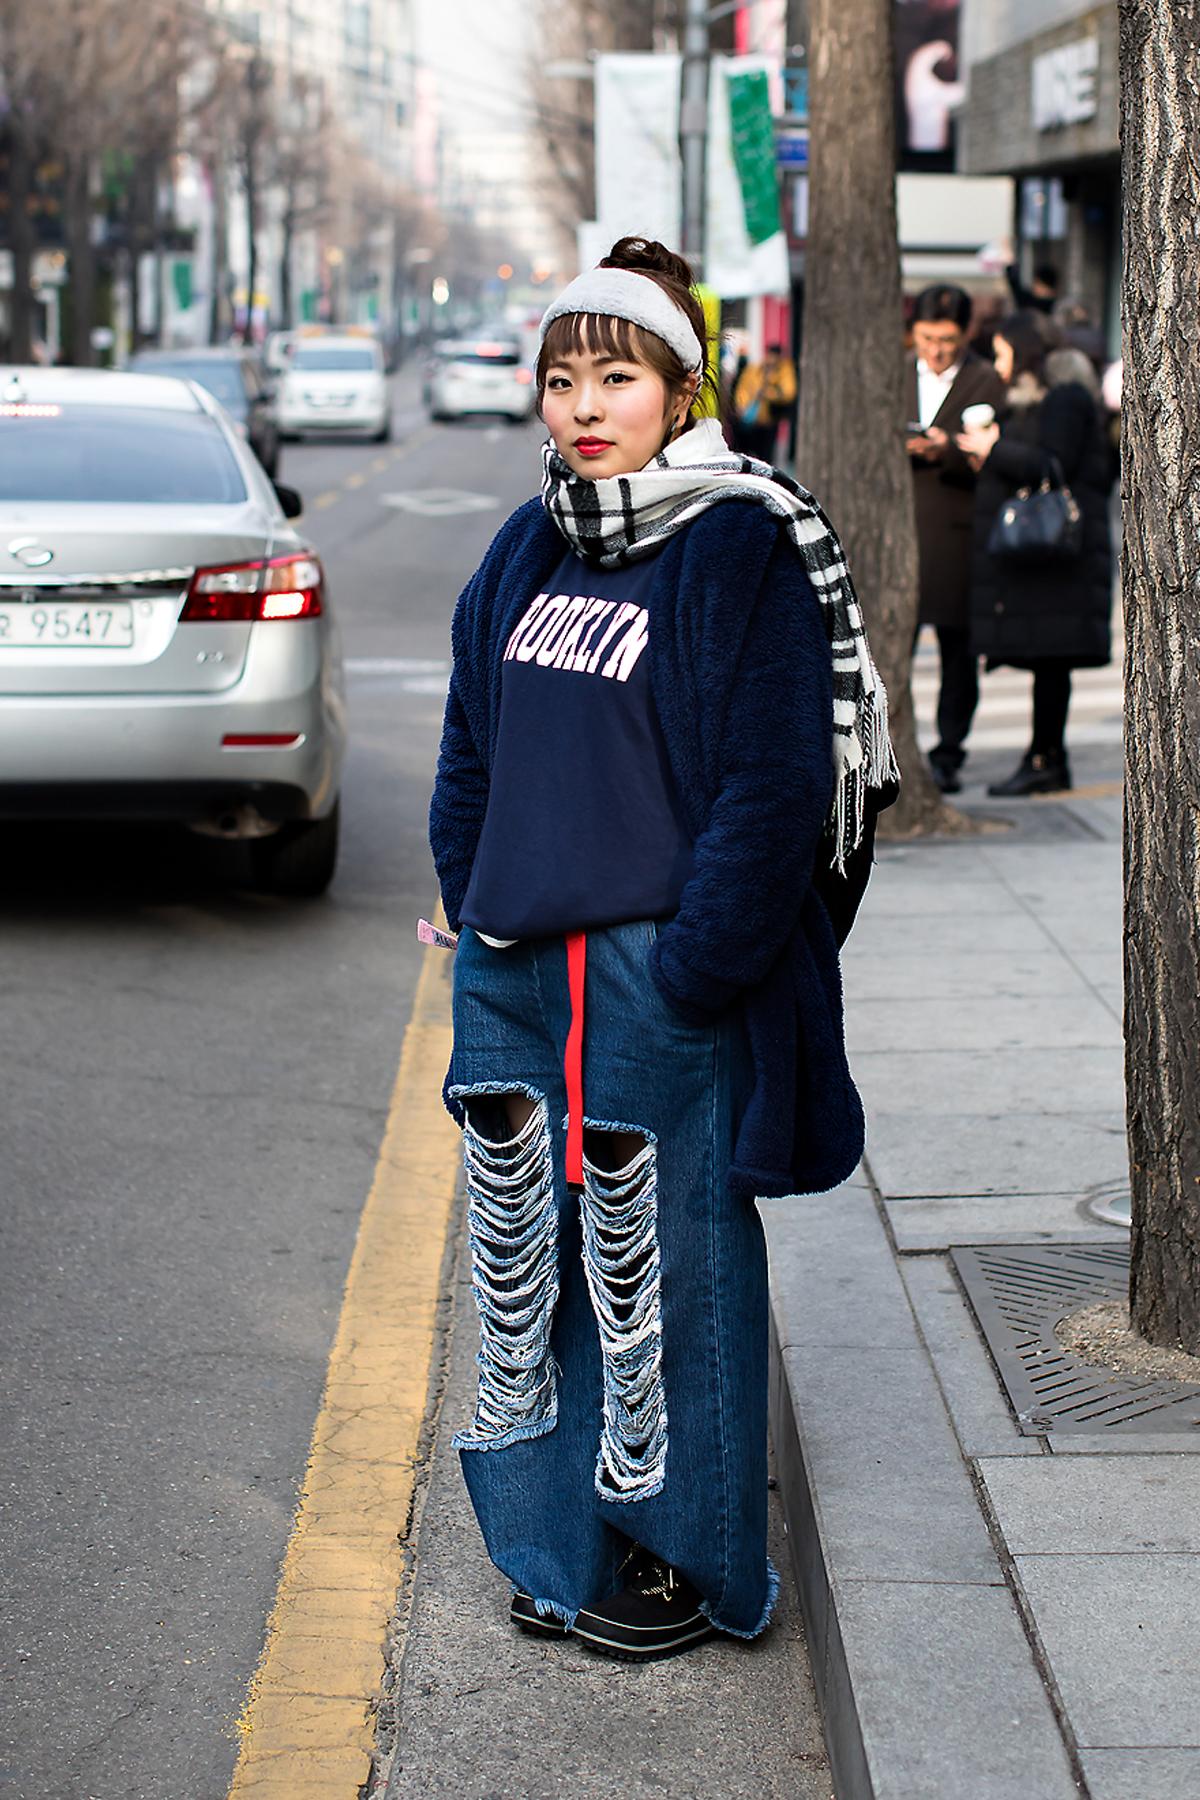 DANDY, Street Fashion 2017 in SEOUL.jpg